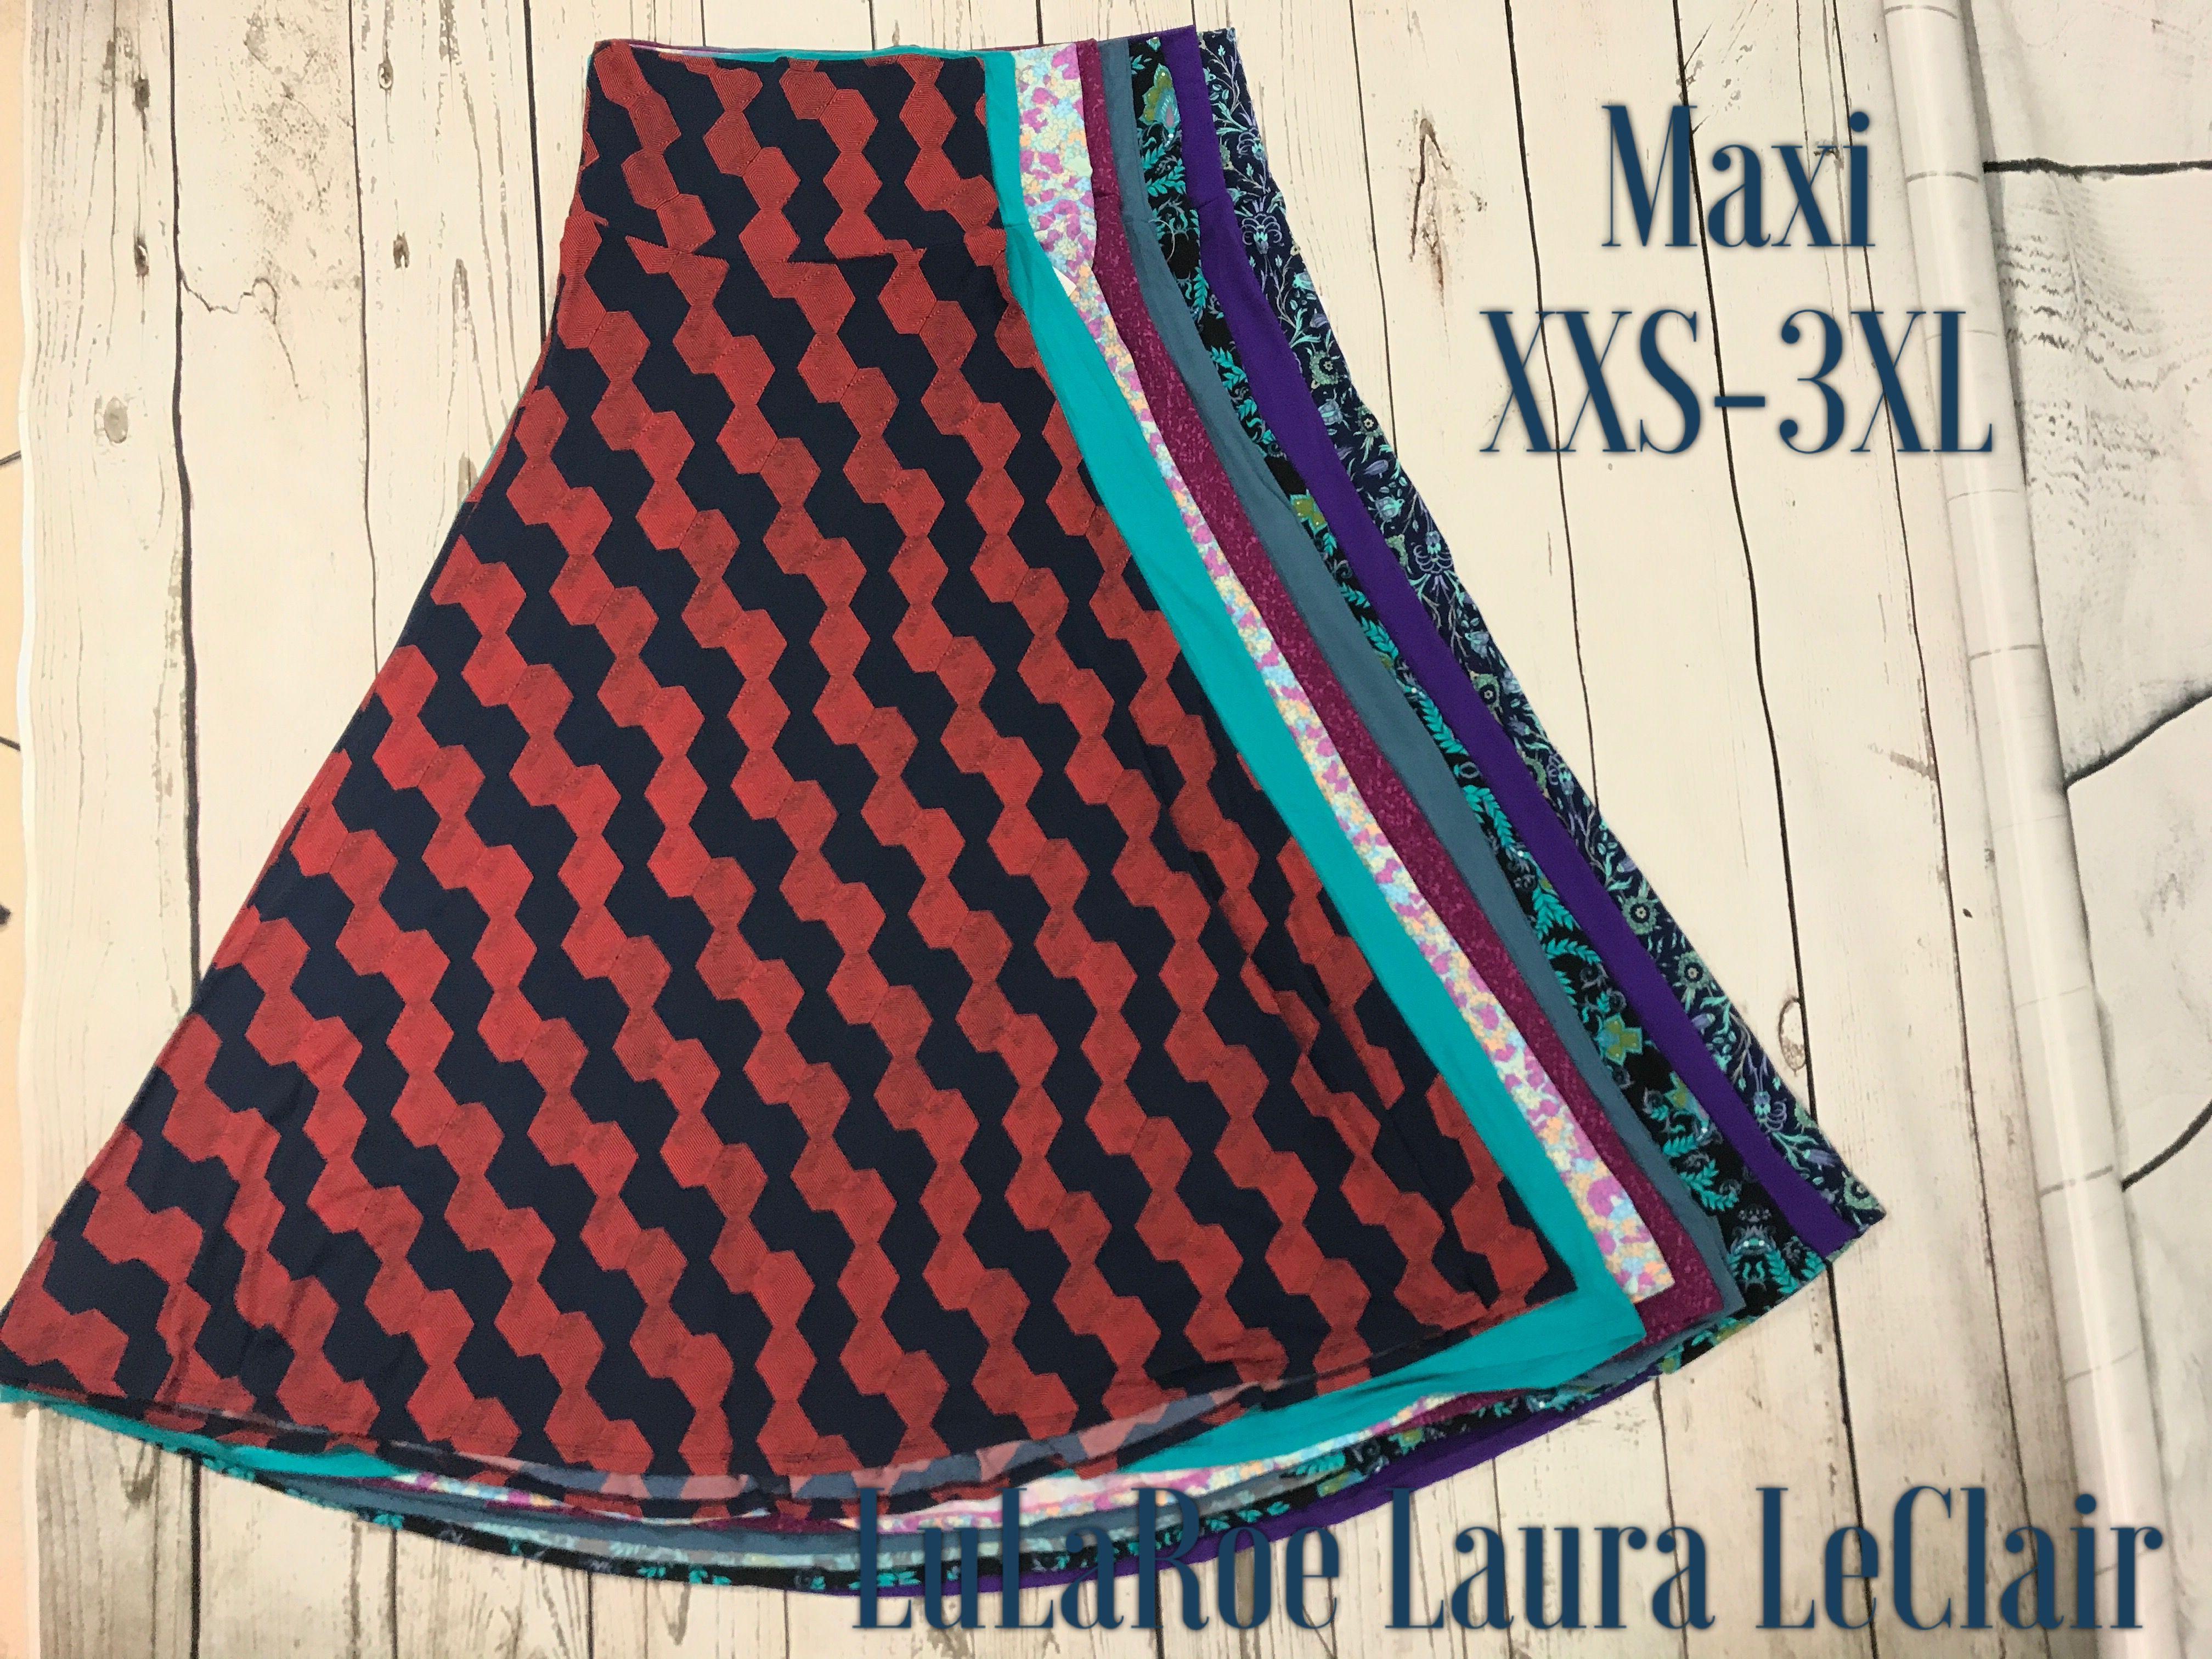 0be0ef4c583 LuLaRoe maxi skirt sizes xxs -3xl size comparisons